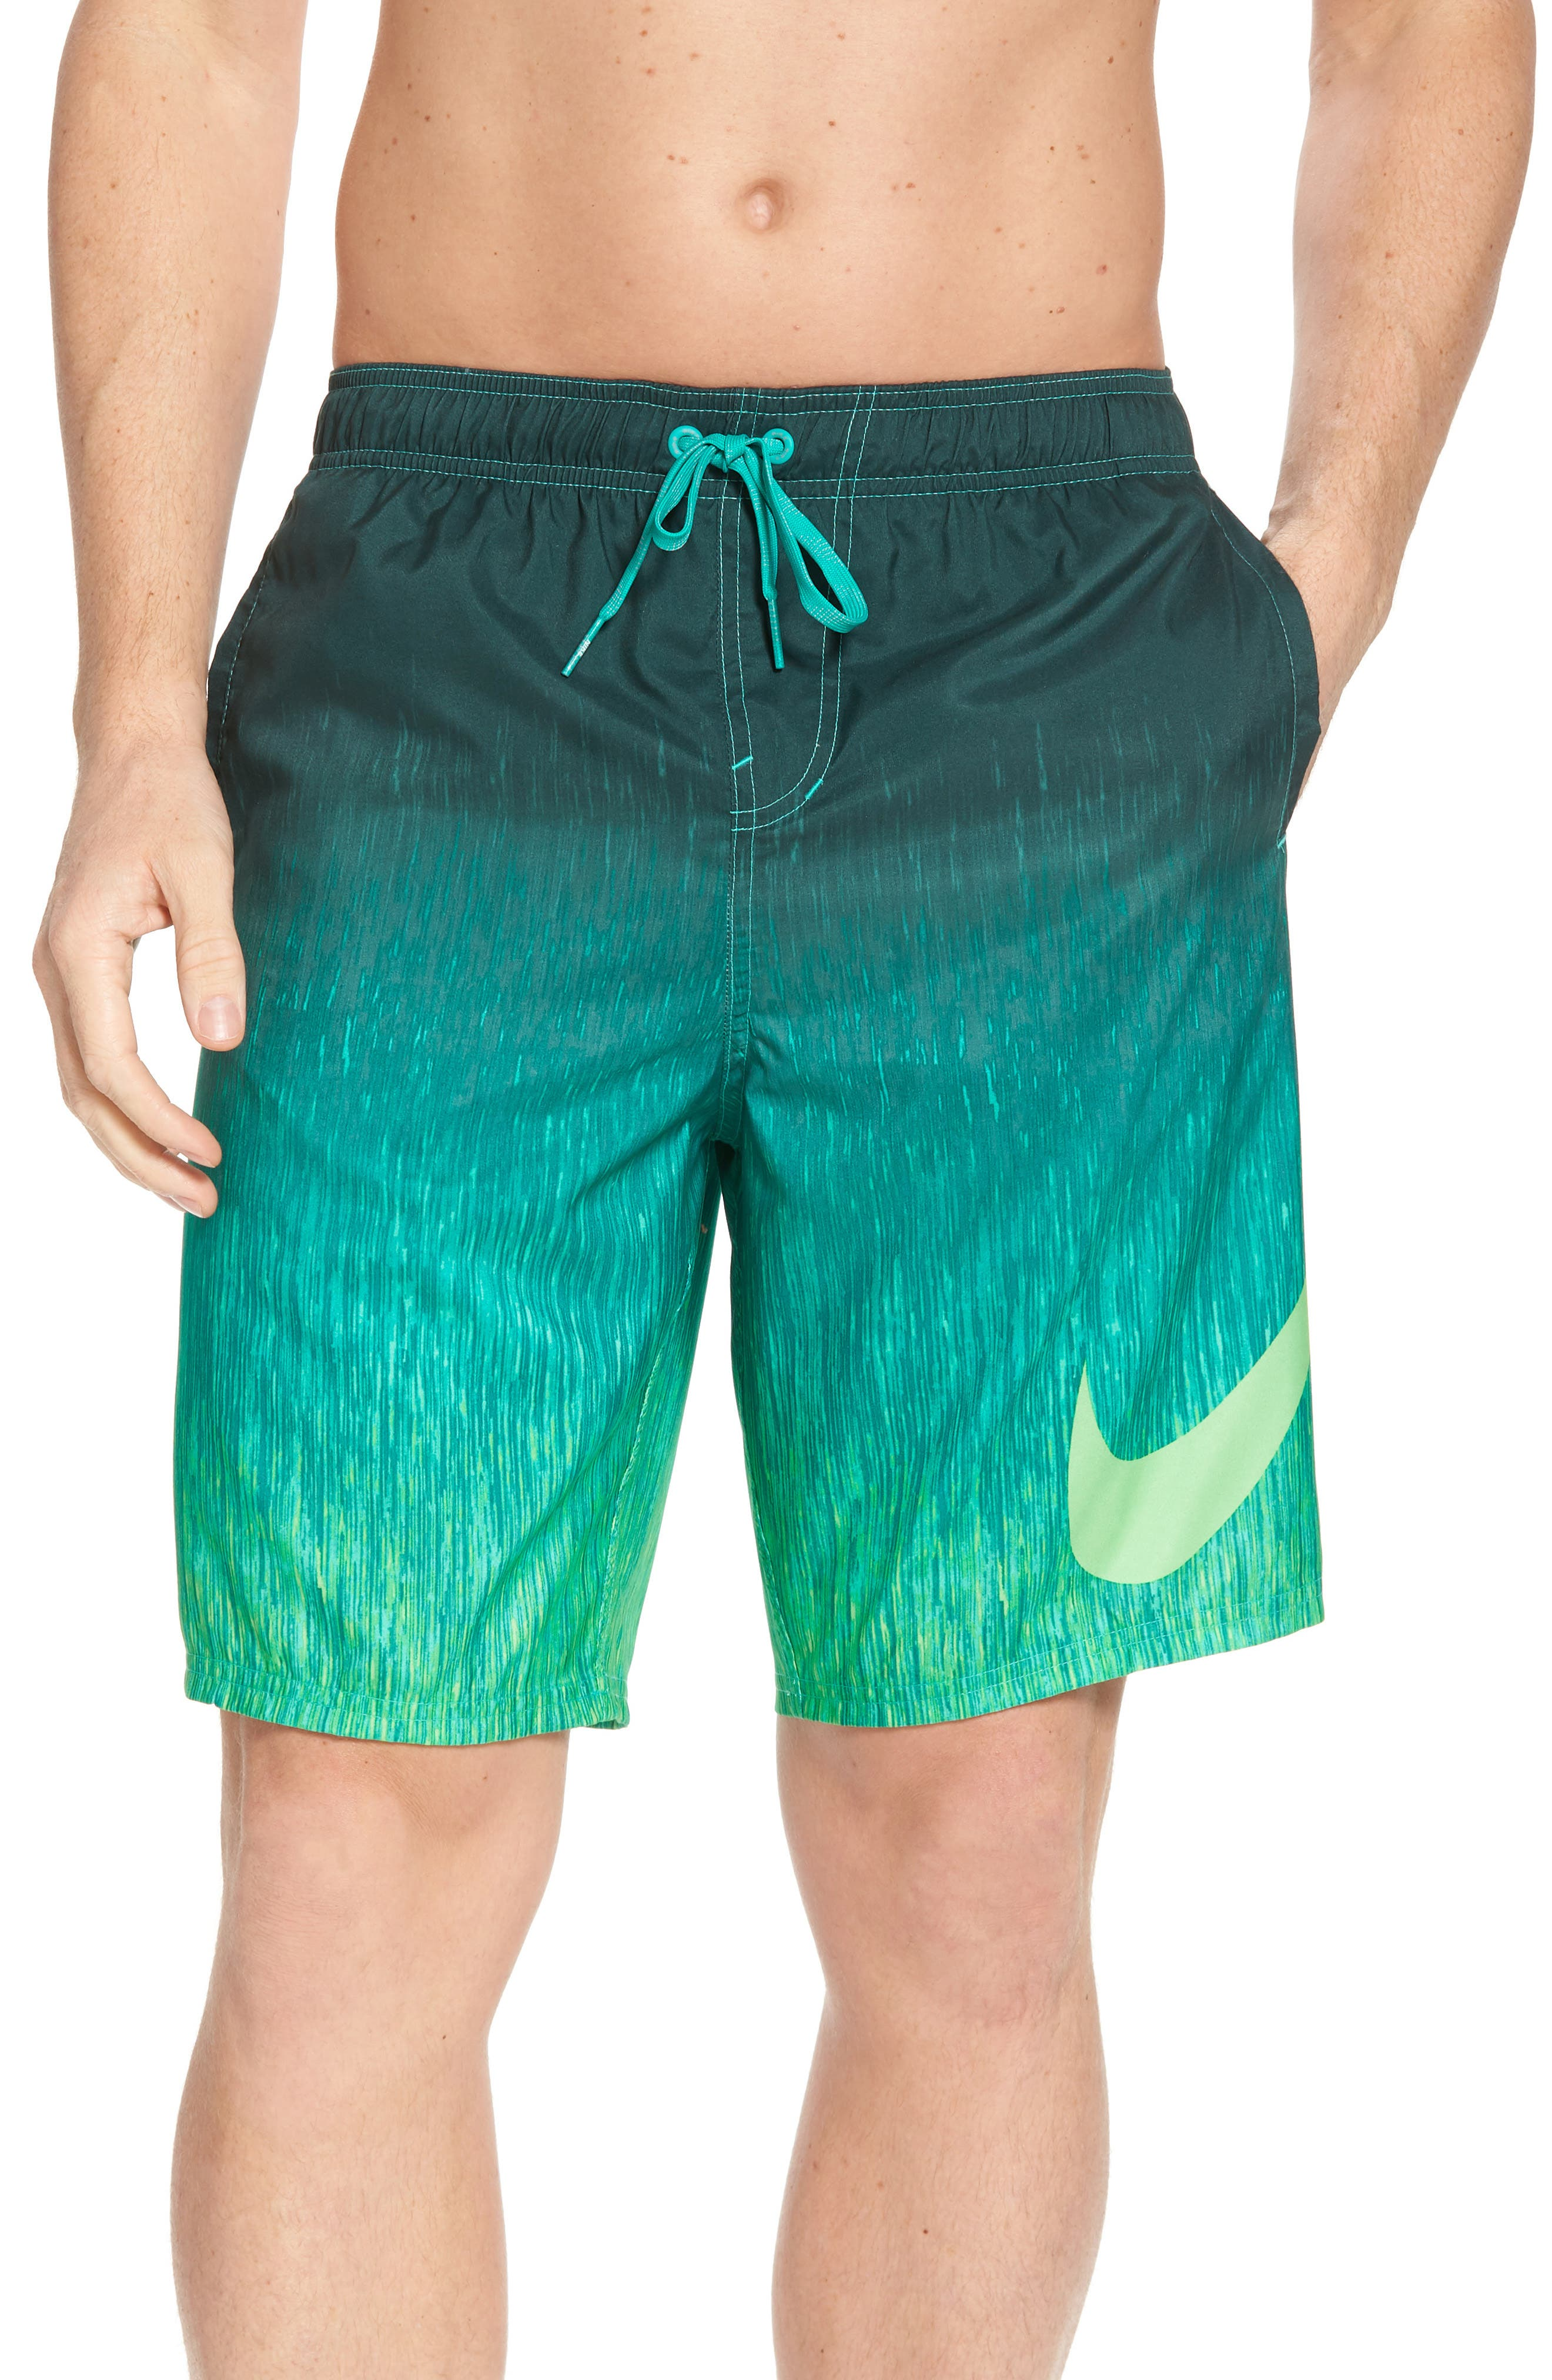 Breaker Swim Trunks,                         Main,                         color, Clear Emerald